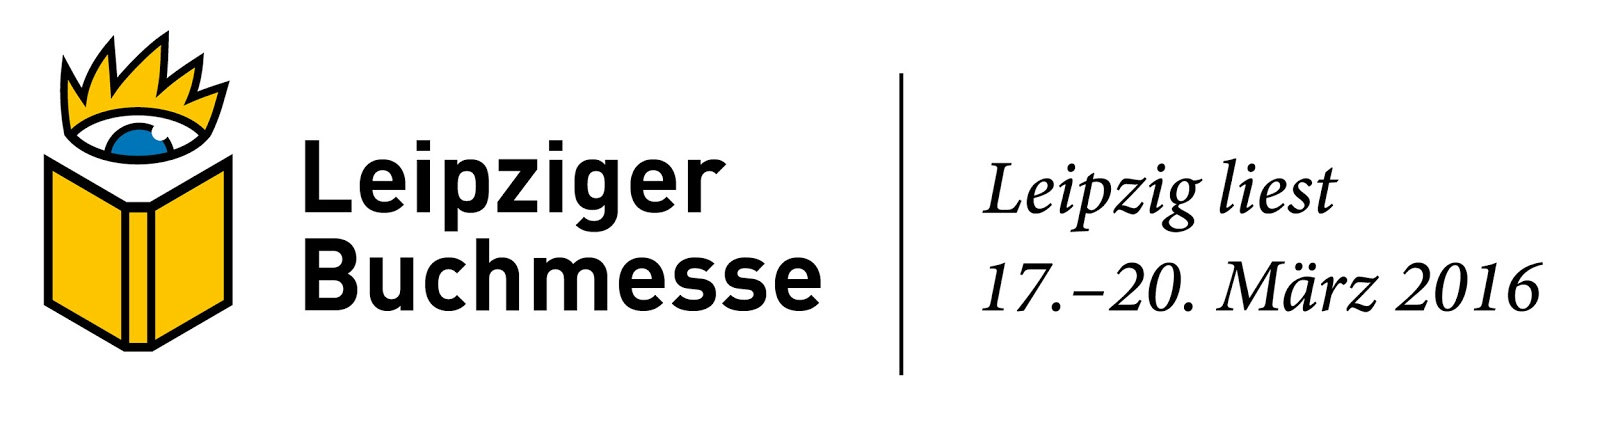 Leipziger Buchmesse #lbm16 - Termine